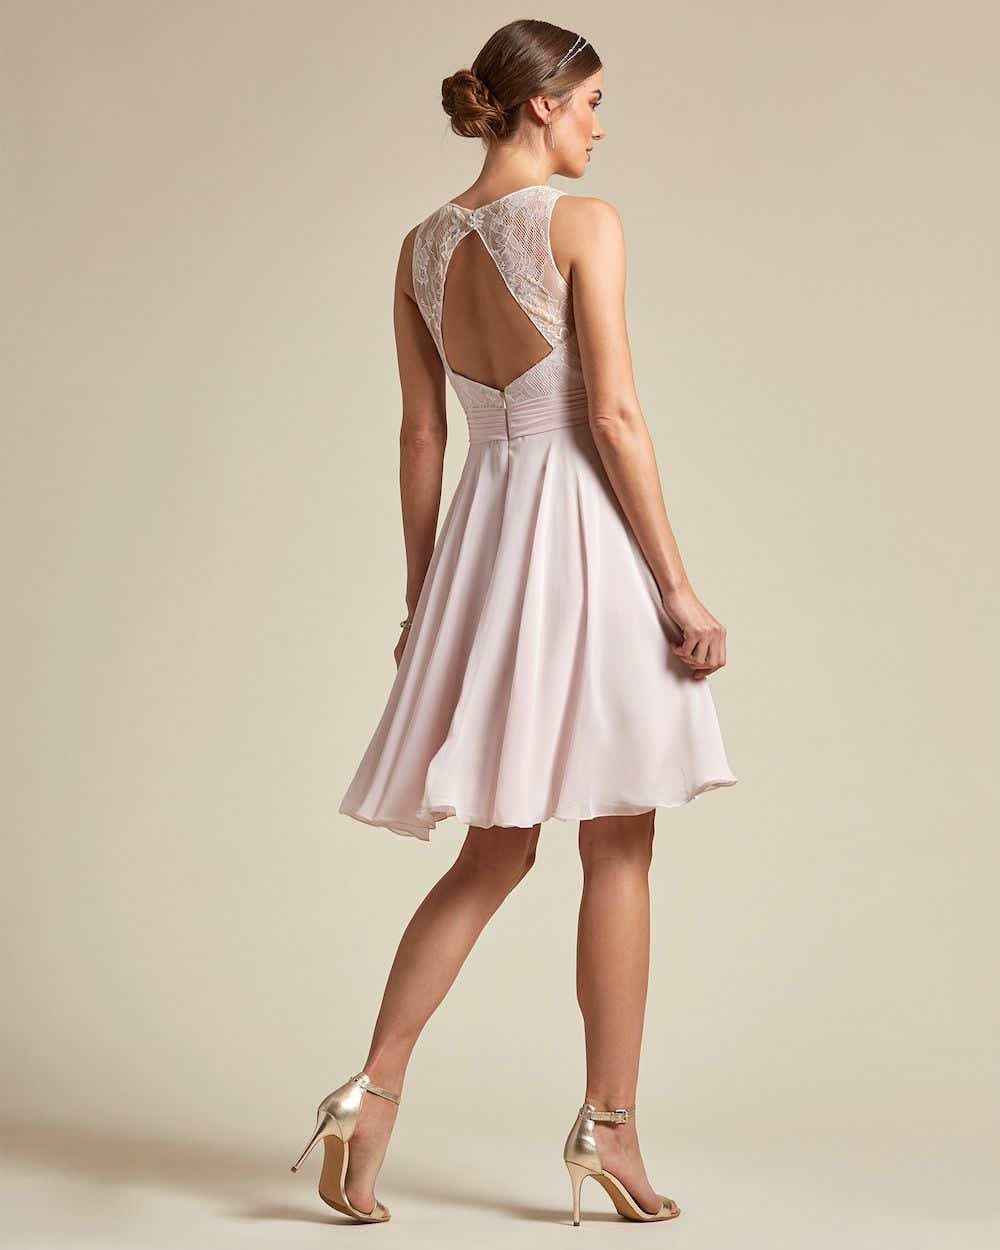 Sweetheart Shaped Lace Maxi Dress - Back